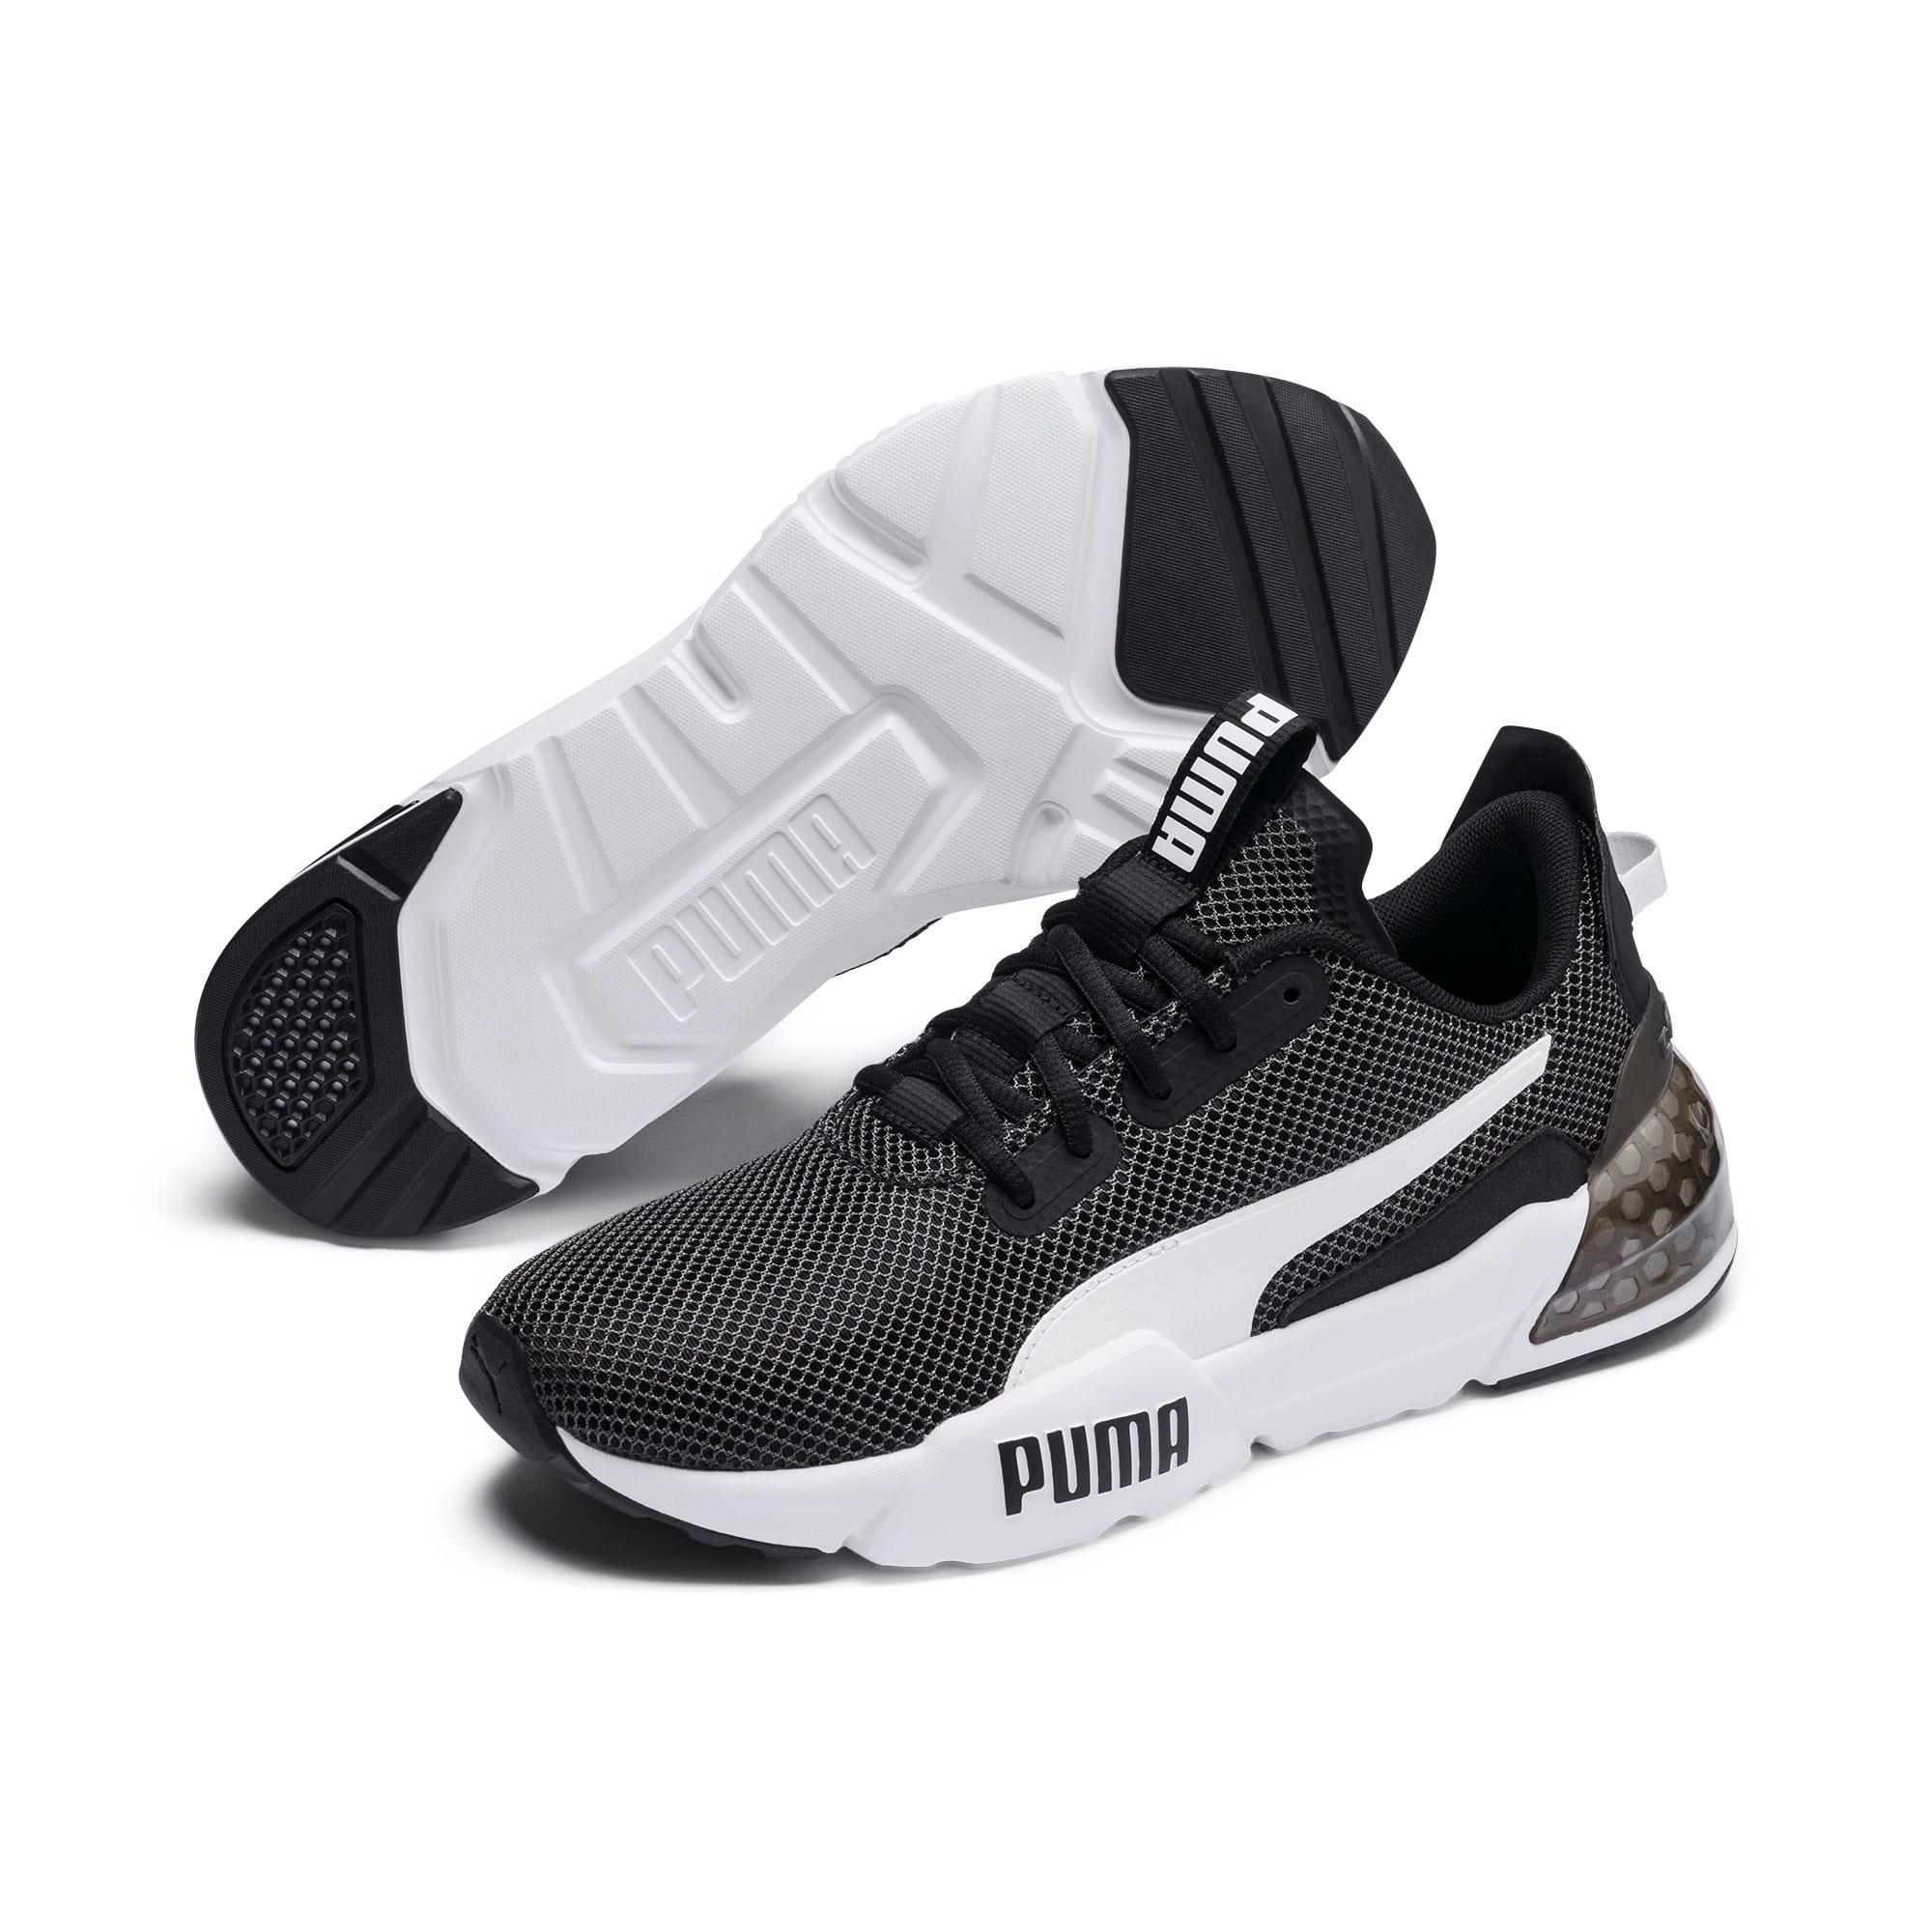 Thumbnail 3 of CELL Phase Men's Training Shoes, Puma Black-Puma White, medium